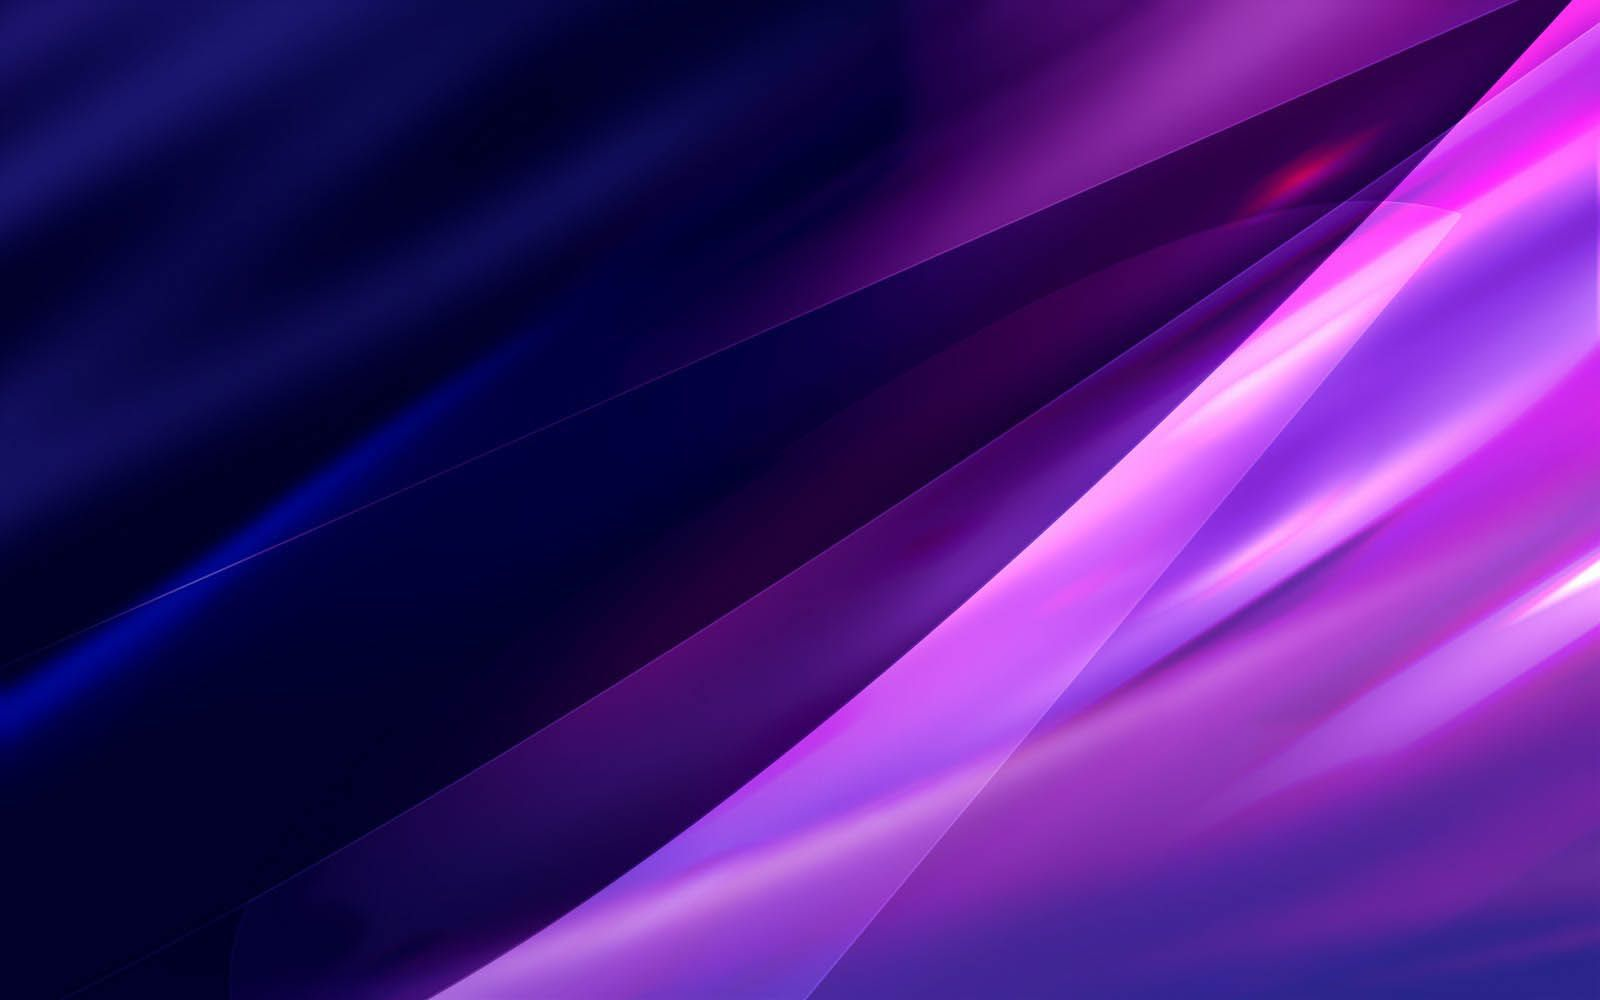 Abstract purple wallpaper also desktop in pinterest rh